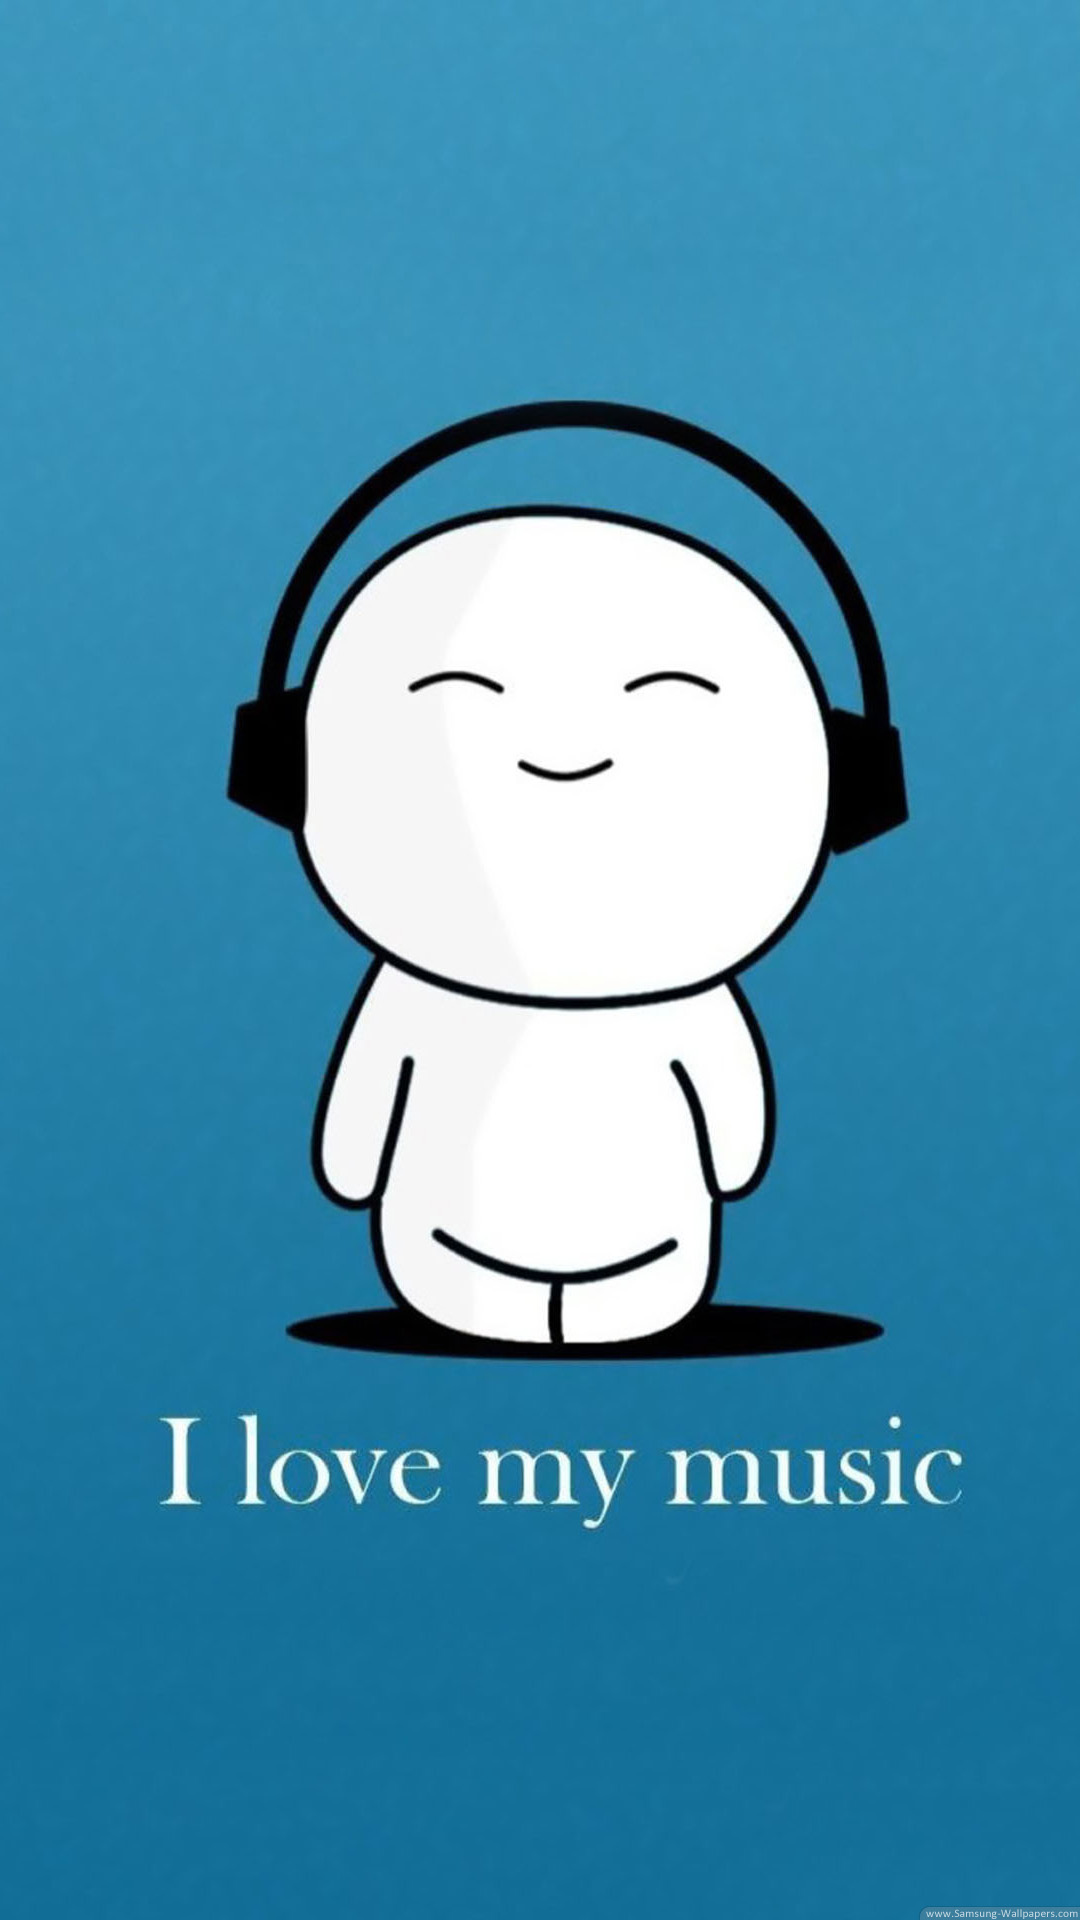 Cartoon Wallpapers I Love My Music Cartoon iPhone 6 Plus ...